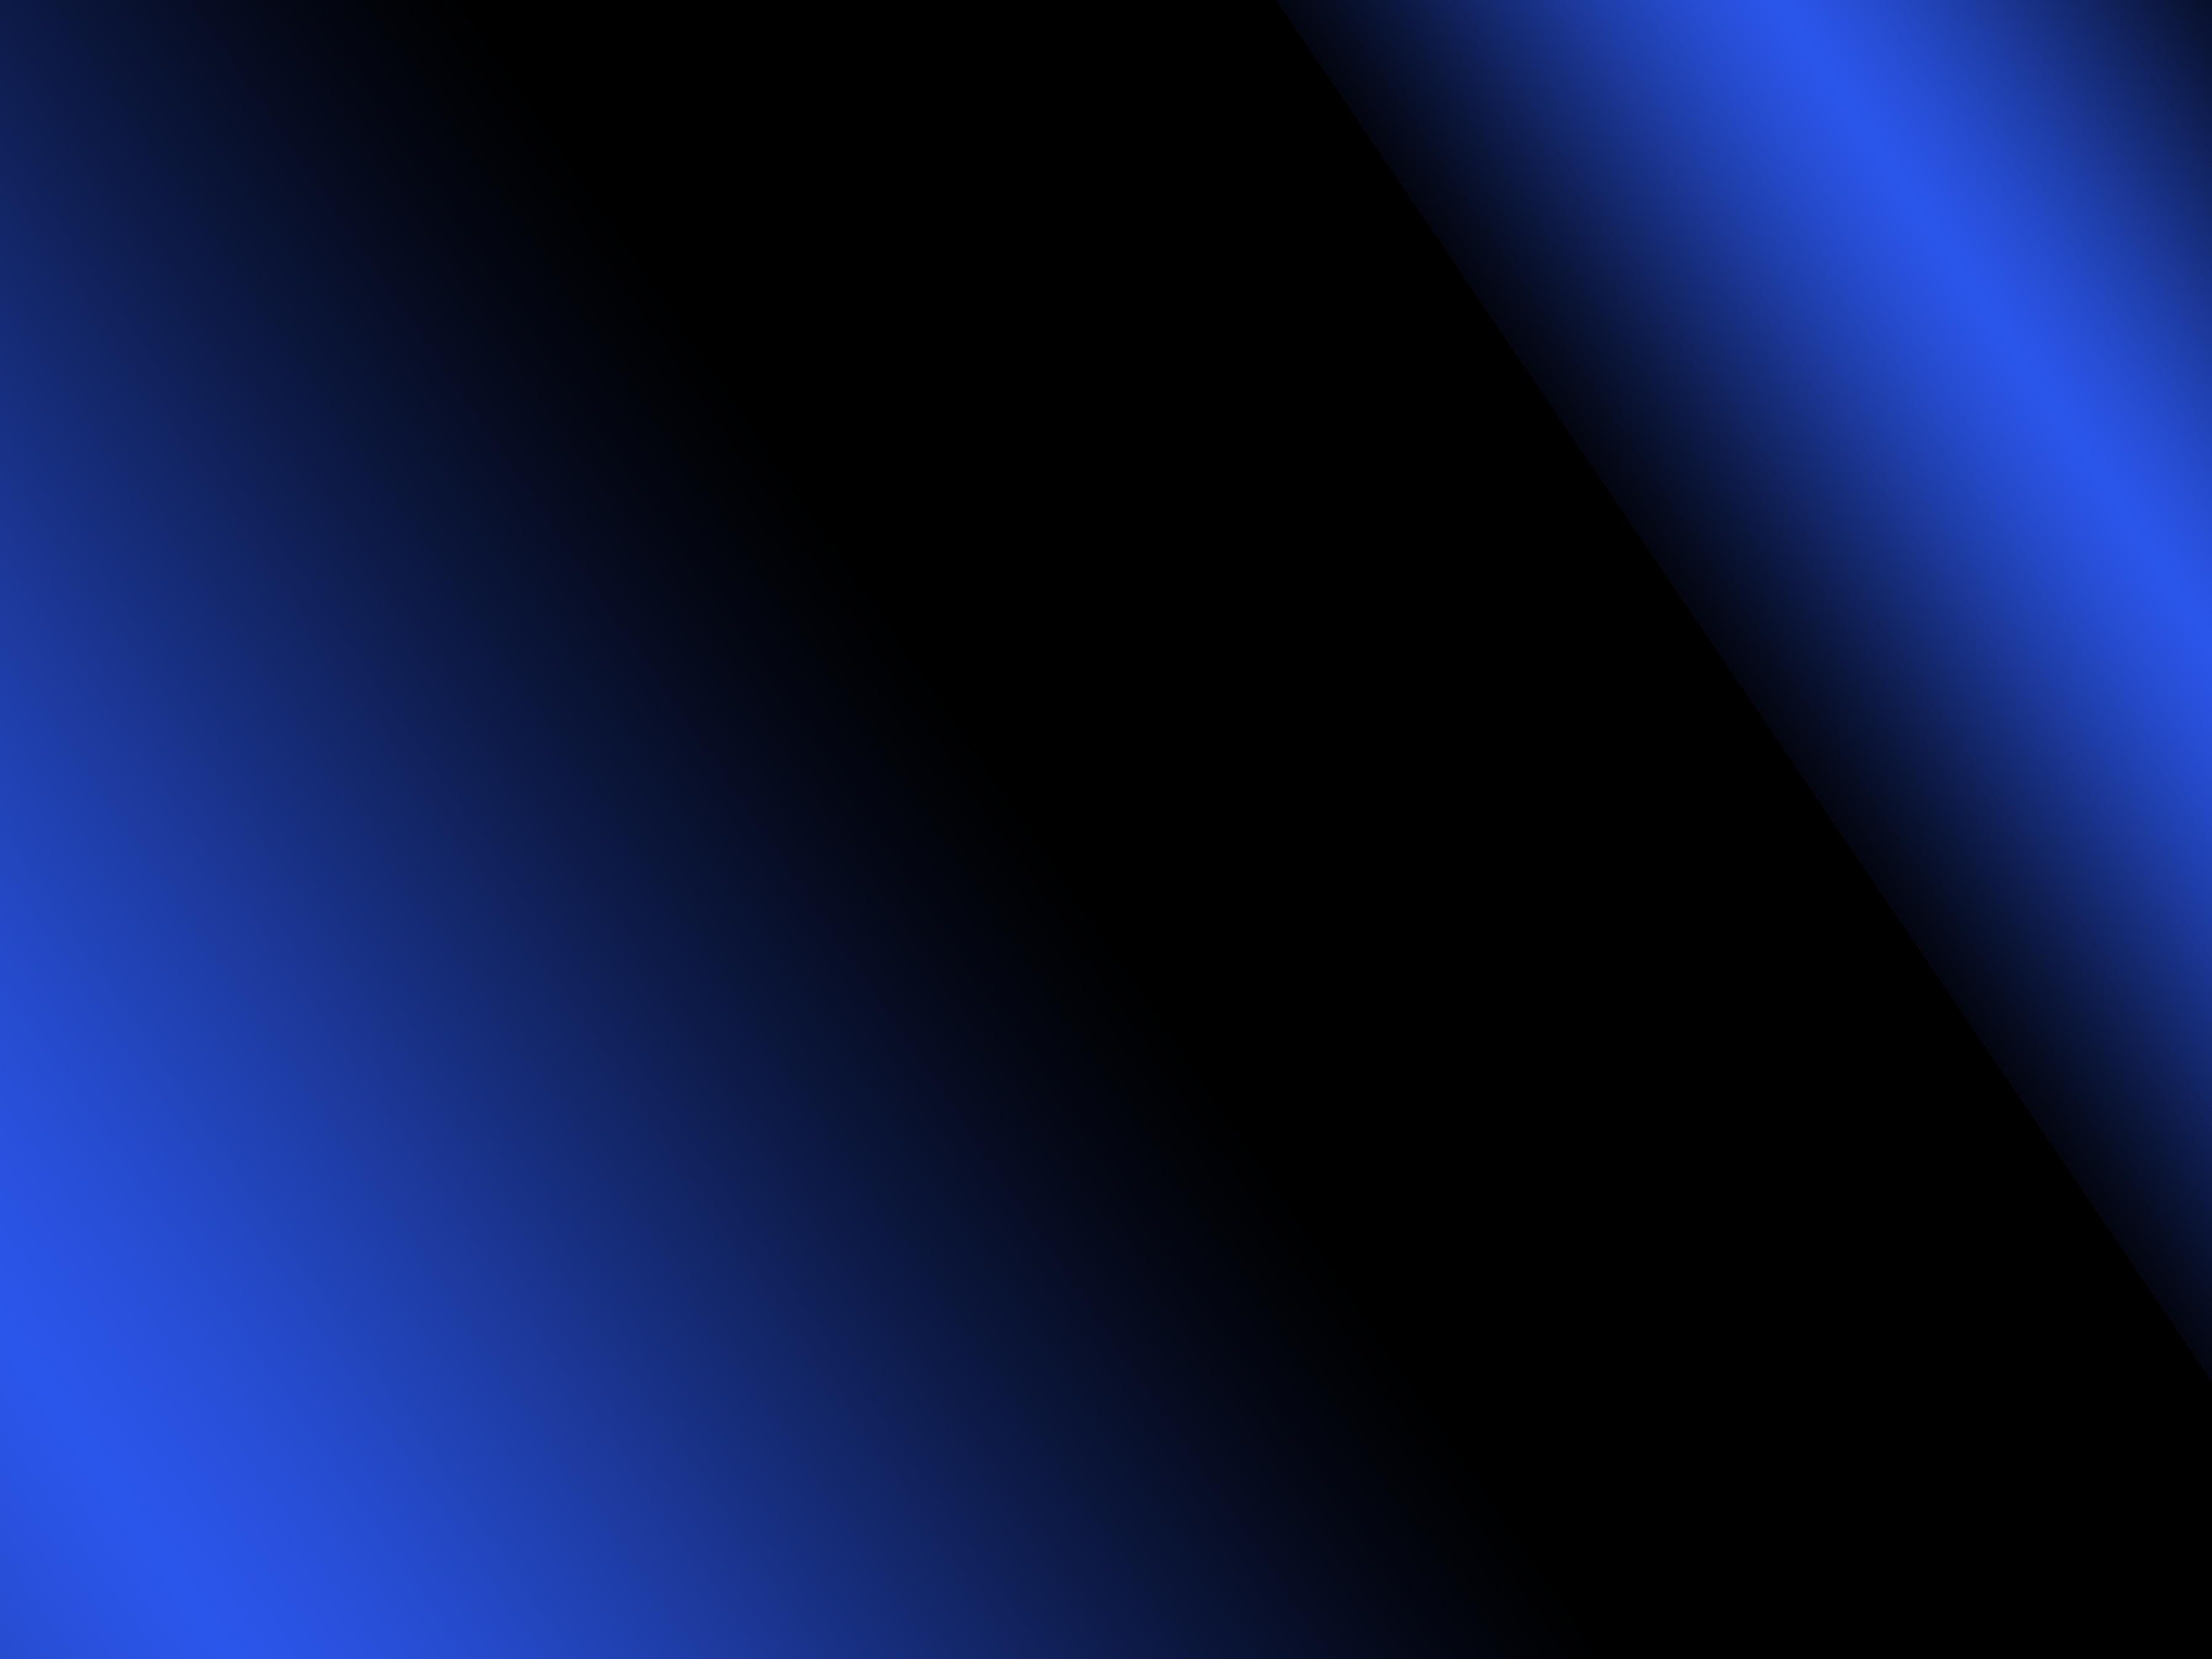 77 Neon Blue Backgrounds On Wallpapersafari